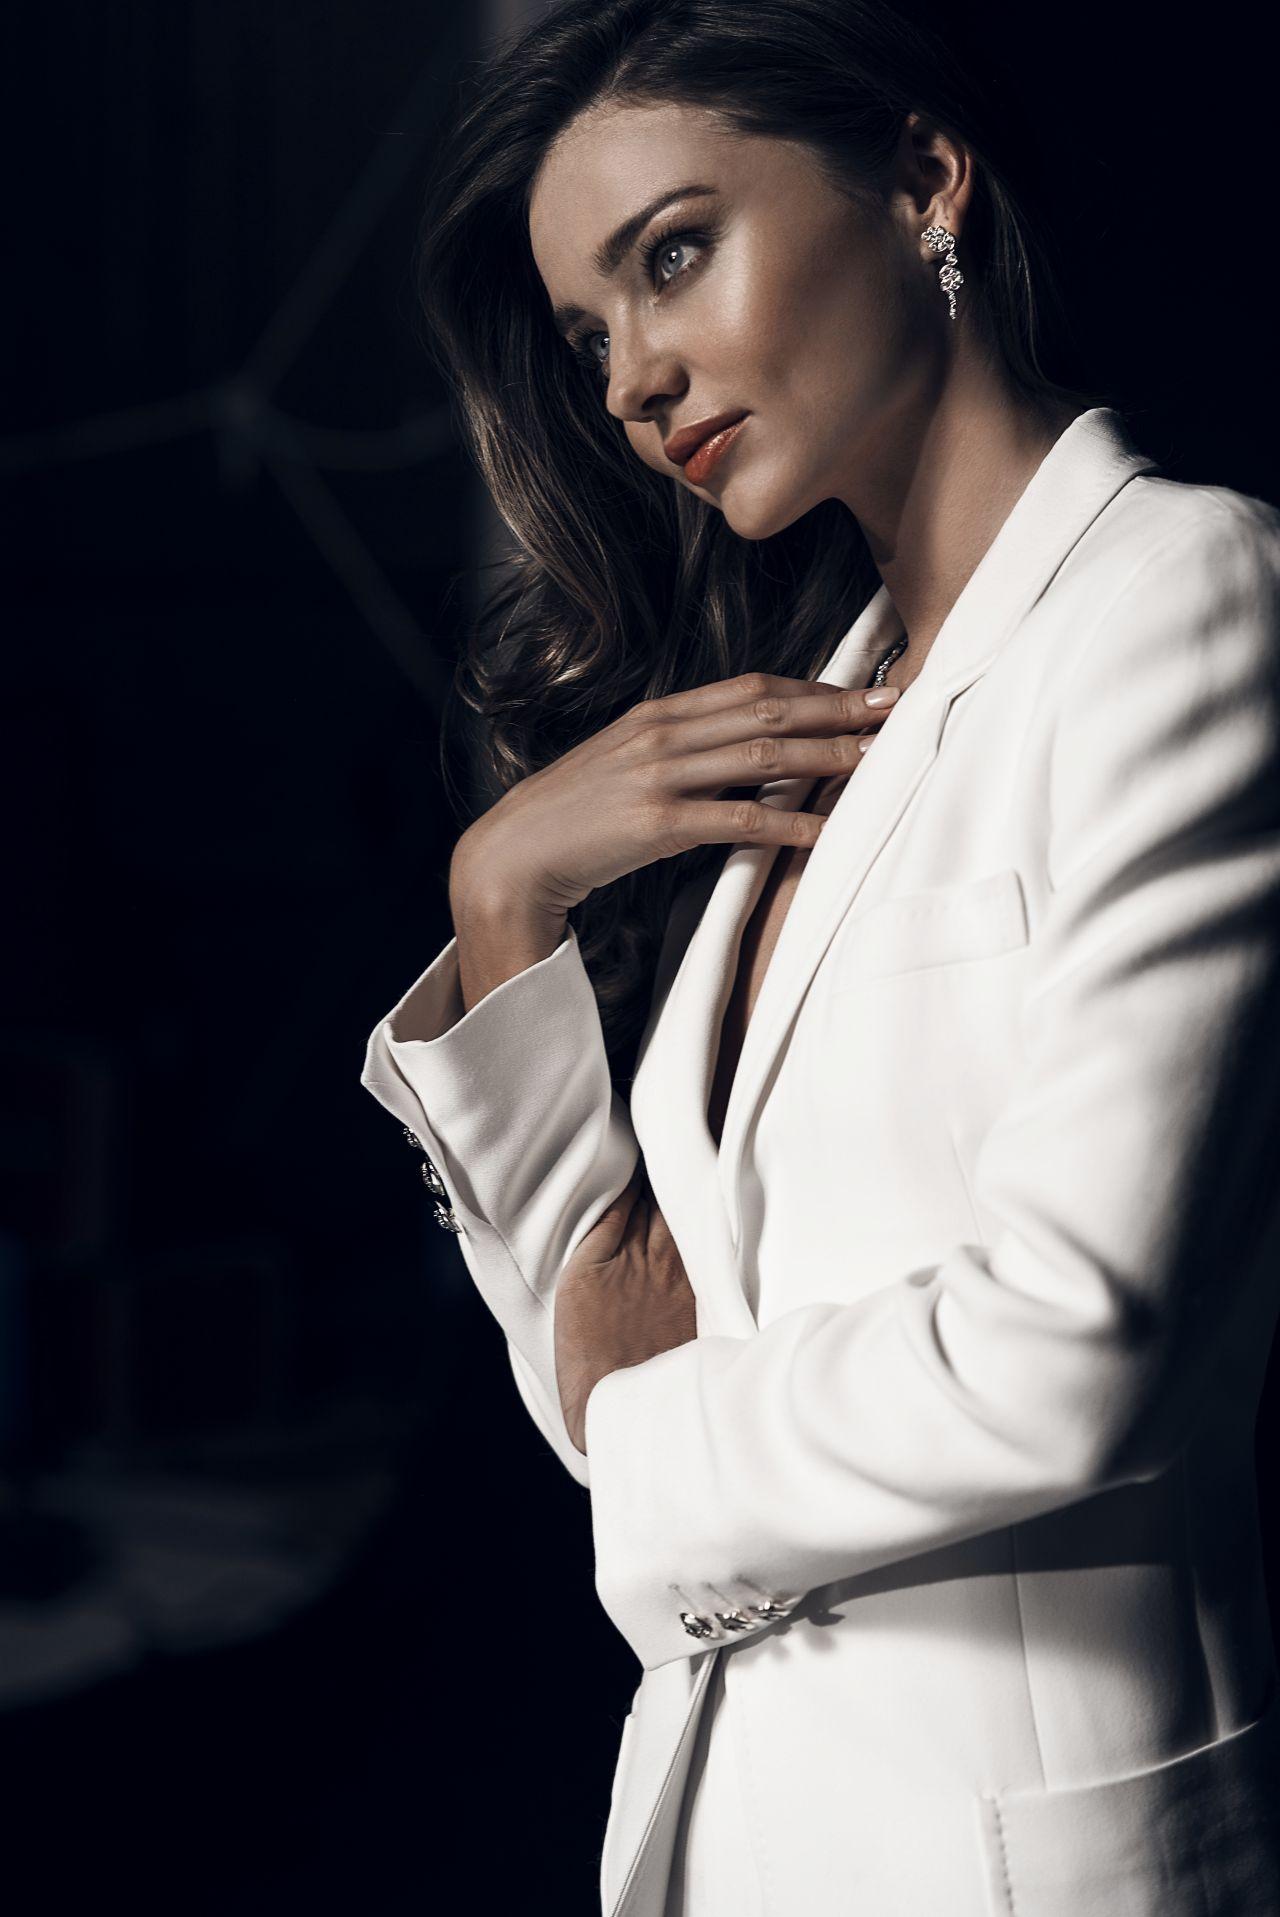 Miranda Kerr Photoshoot Swarovski Holiday 2015 Collection